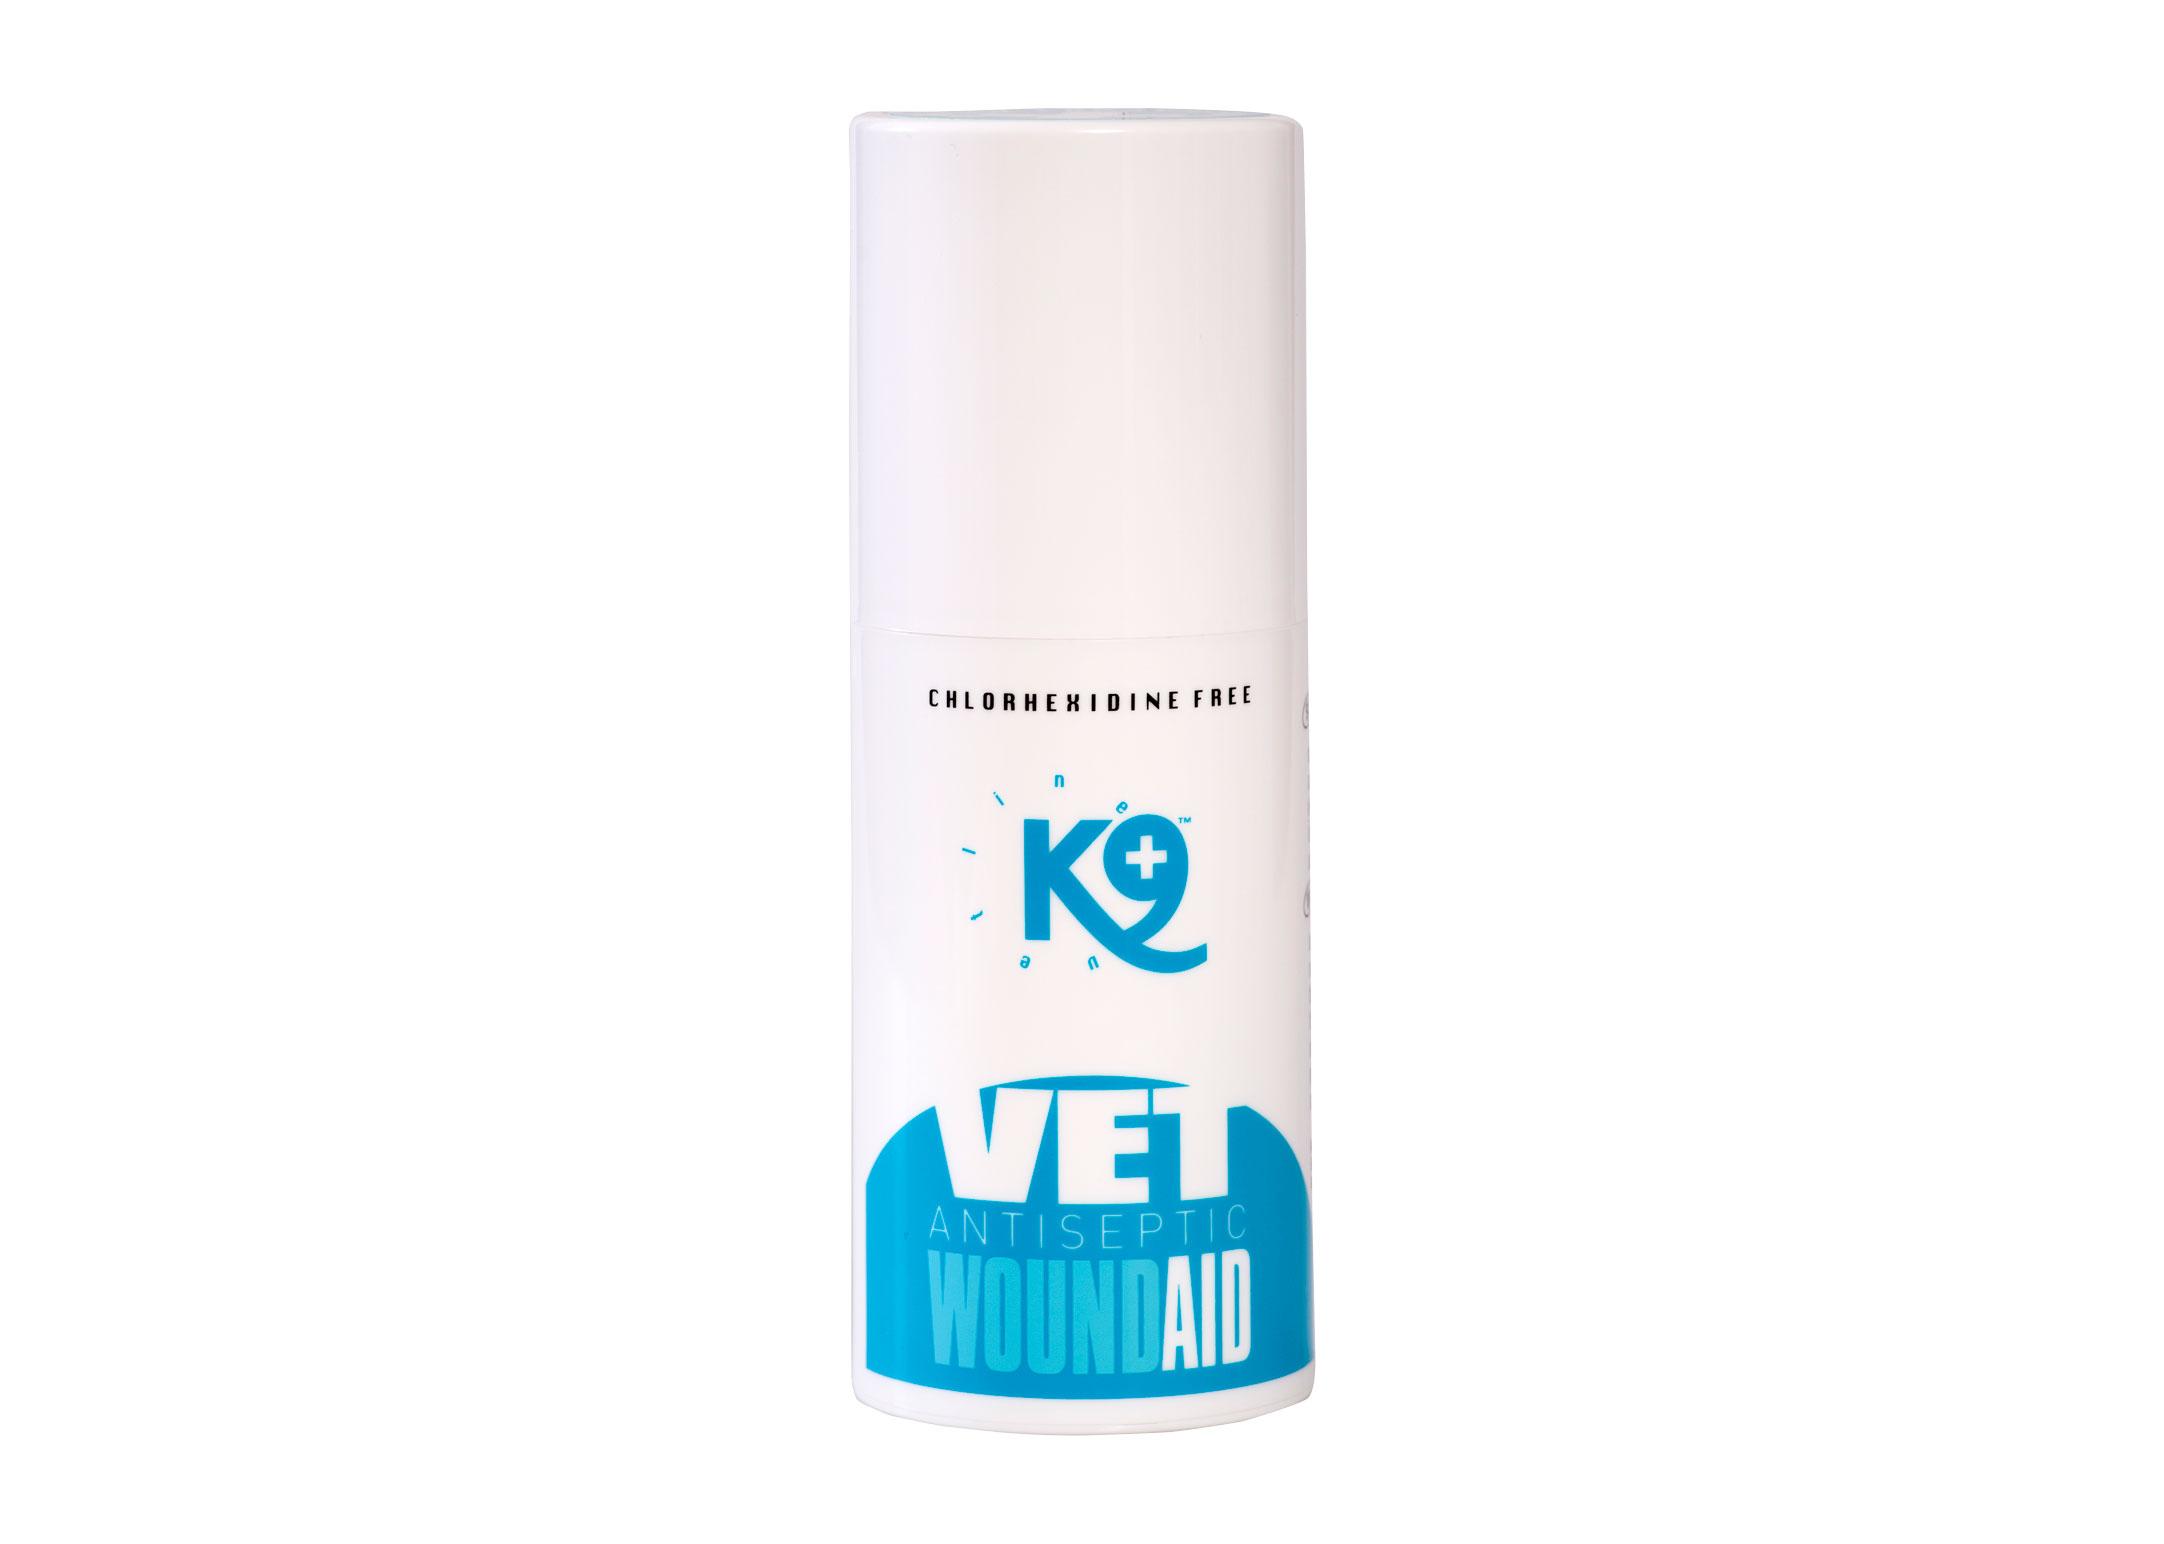 K9 Vetline Antiseptic Wound Aid 250 ml